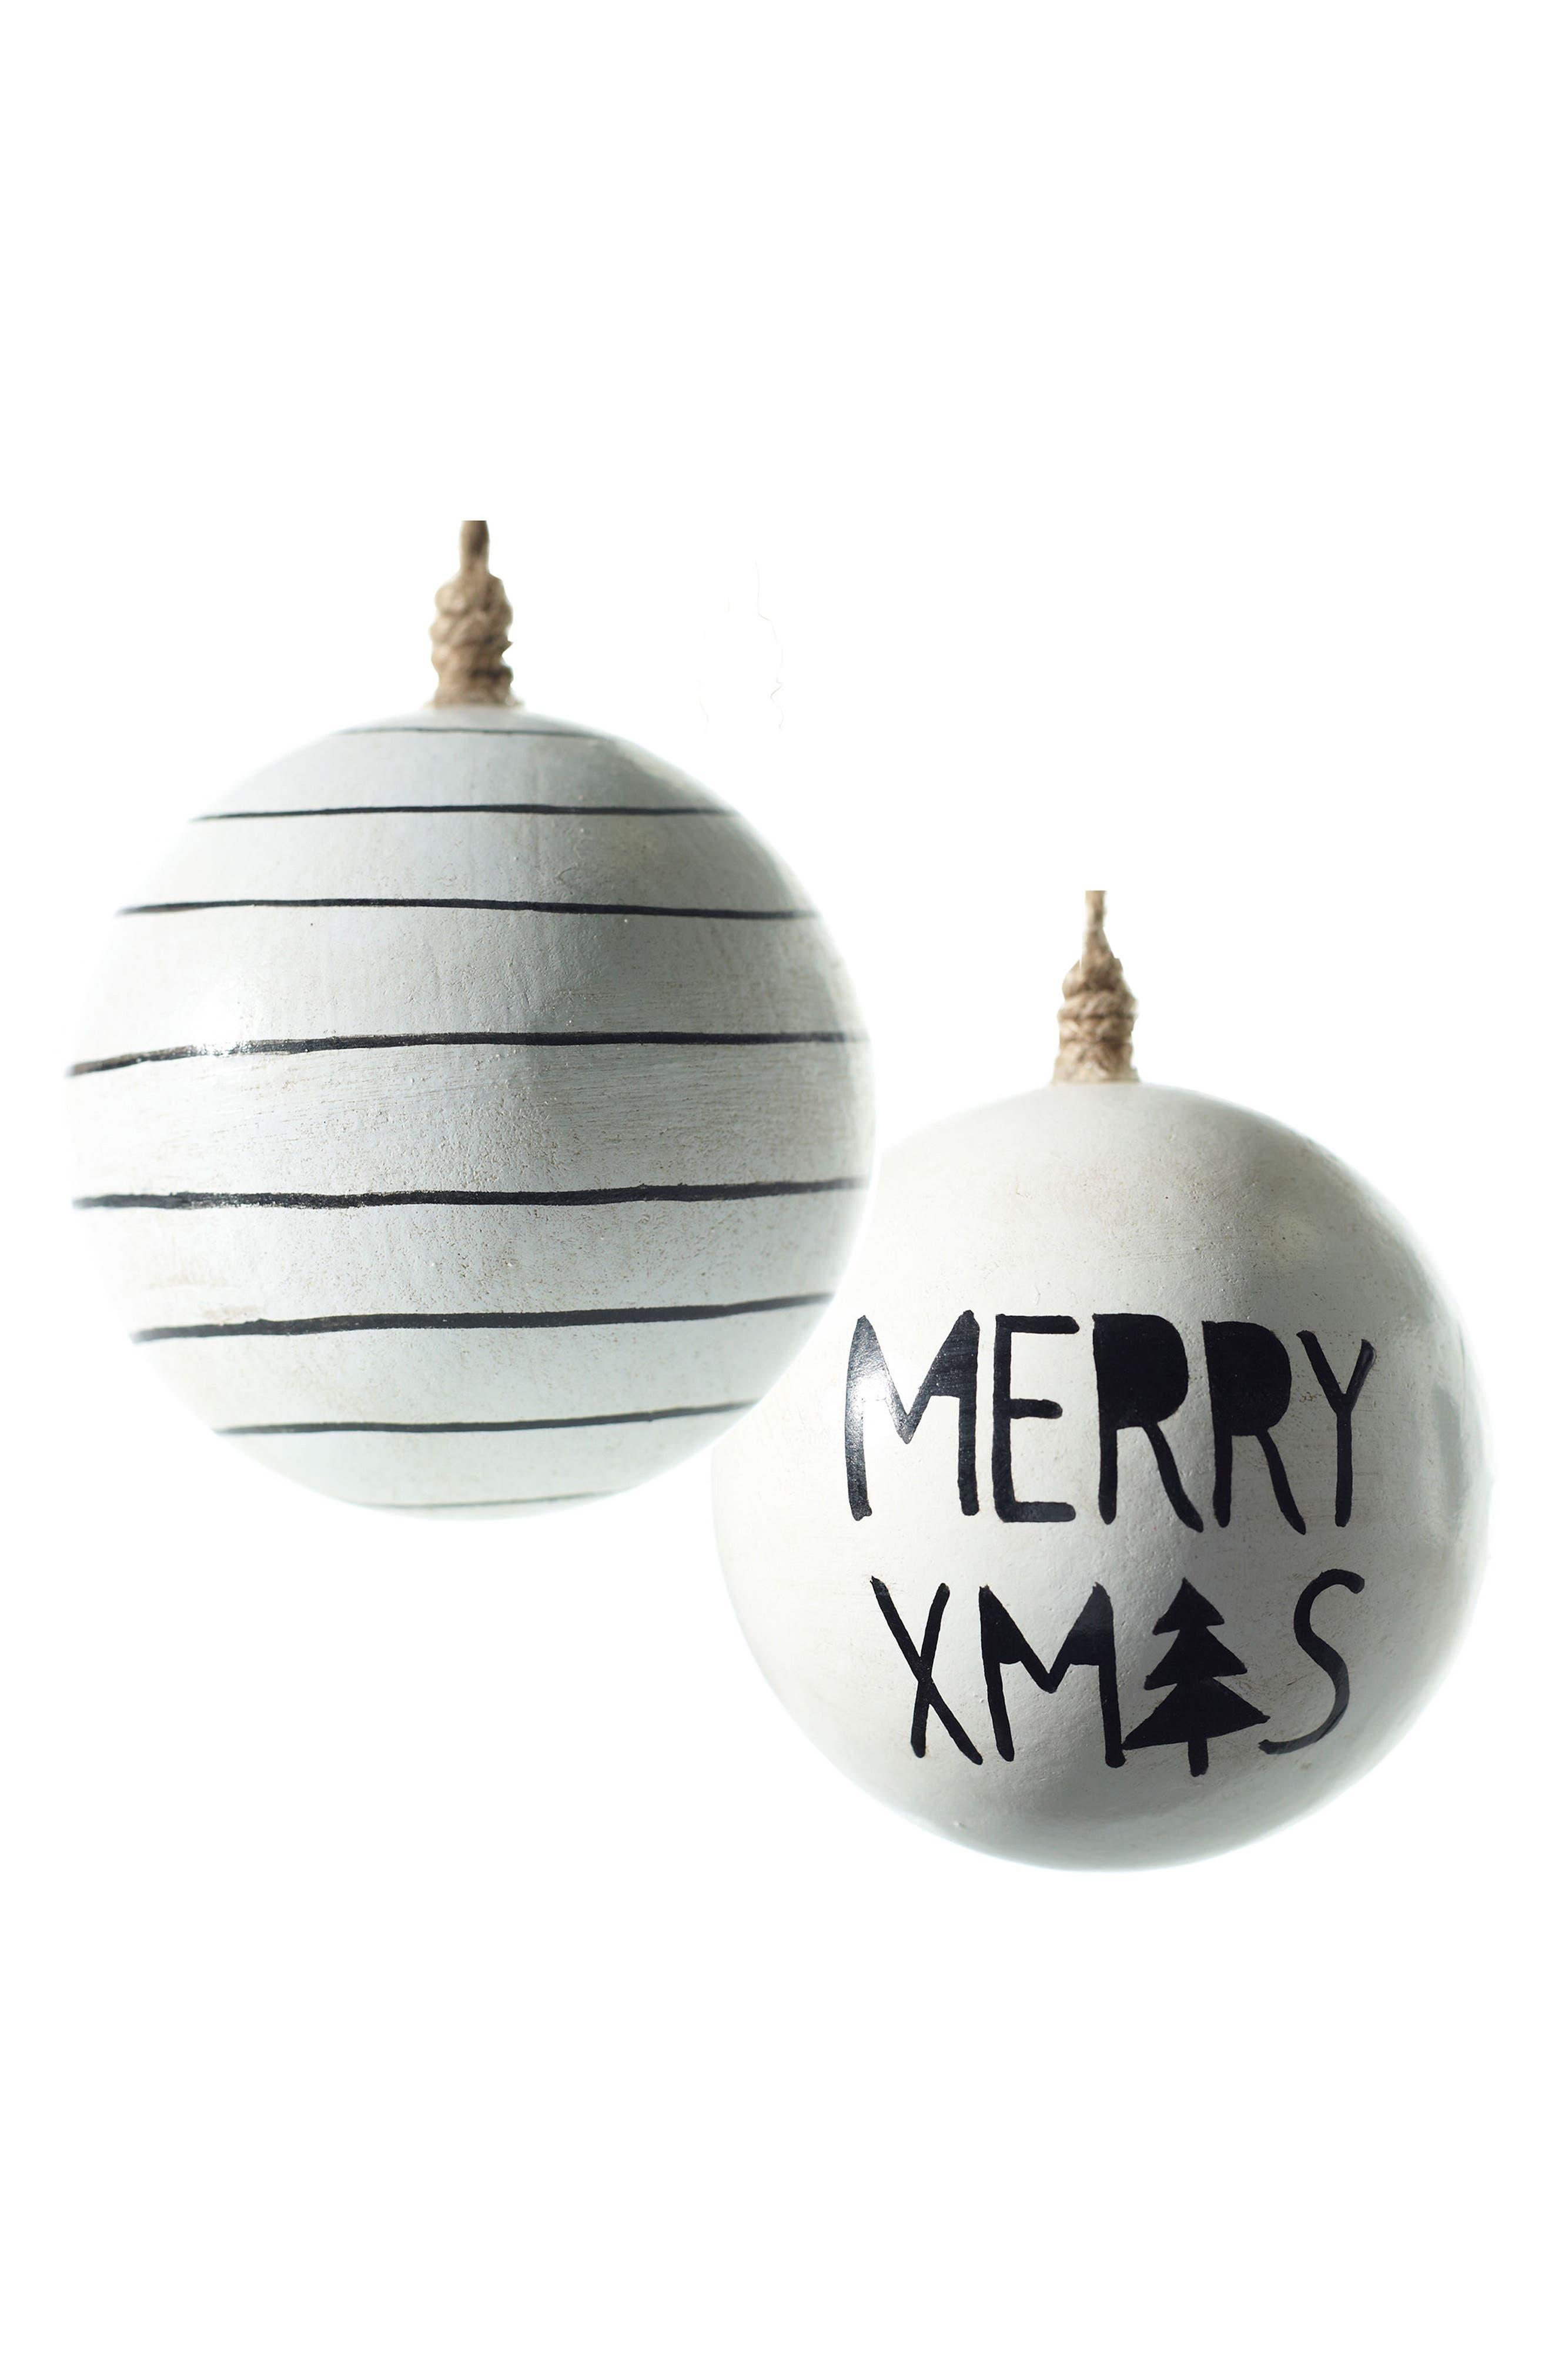 Merry Xmas Set of 2 Wooden Ball Ornaments,                         Main,                         color, 100